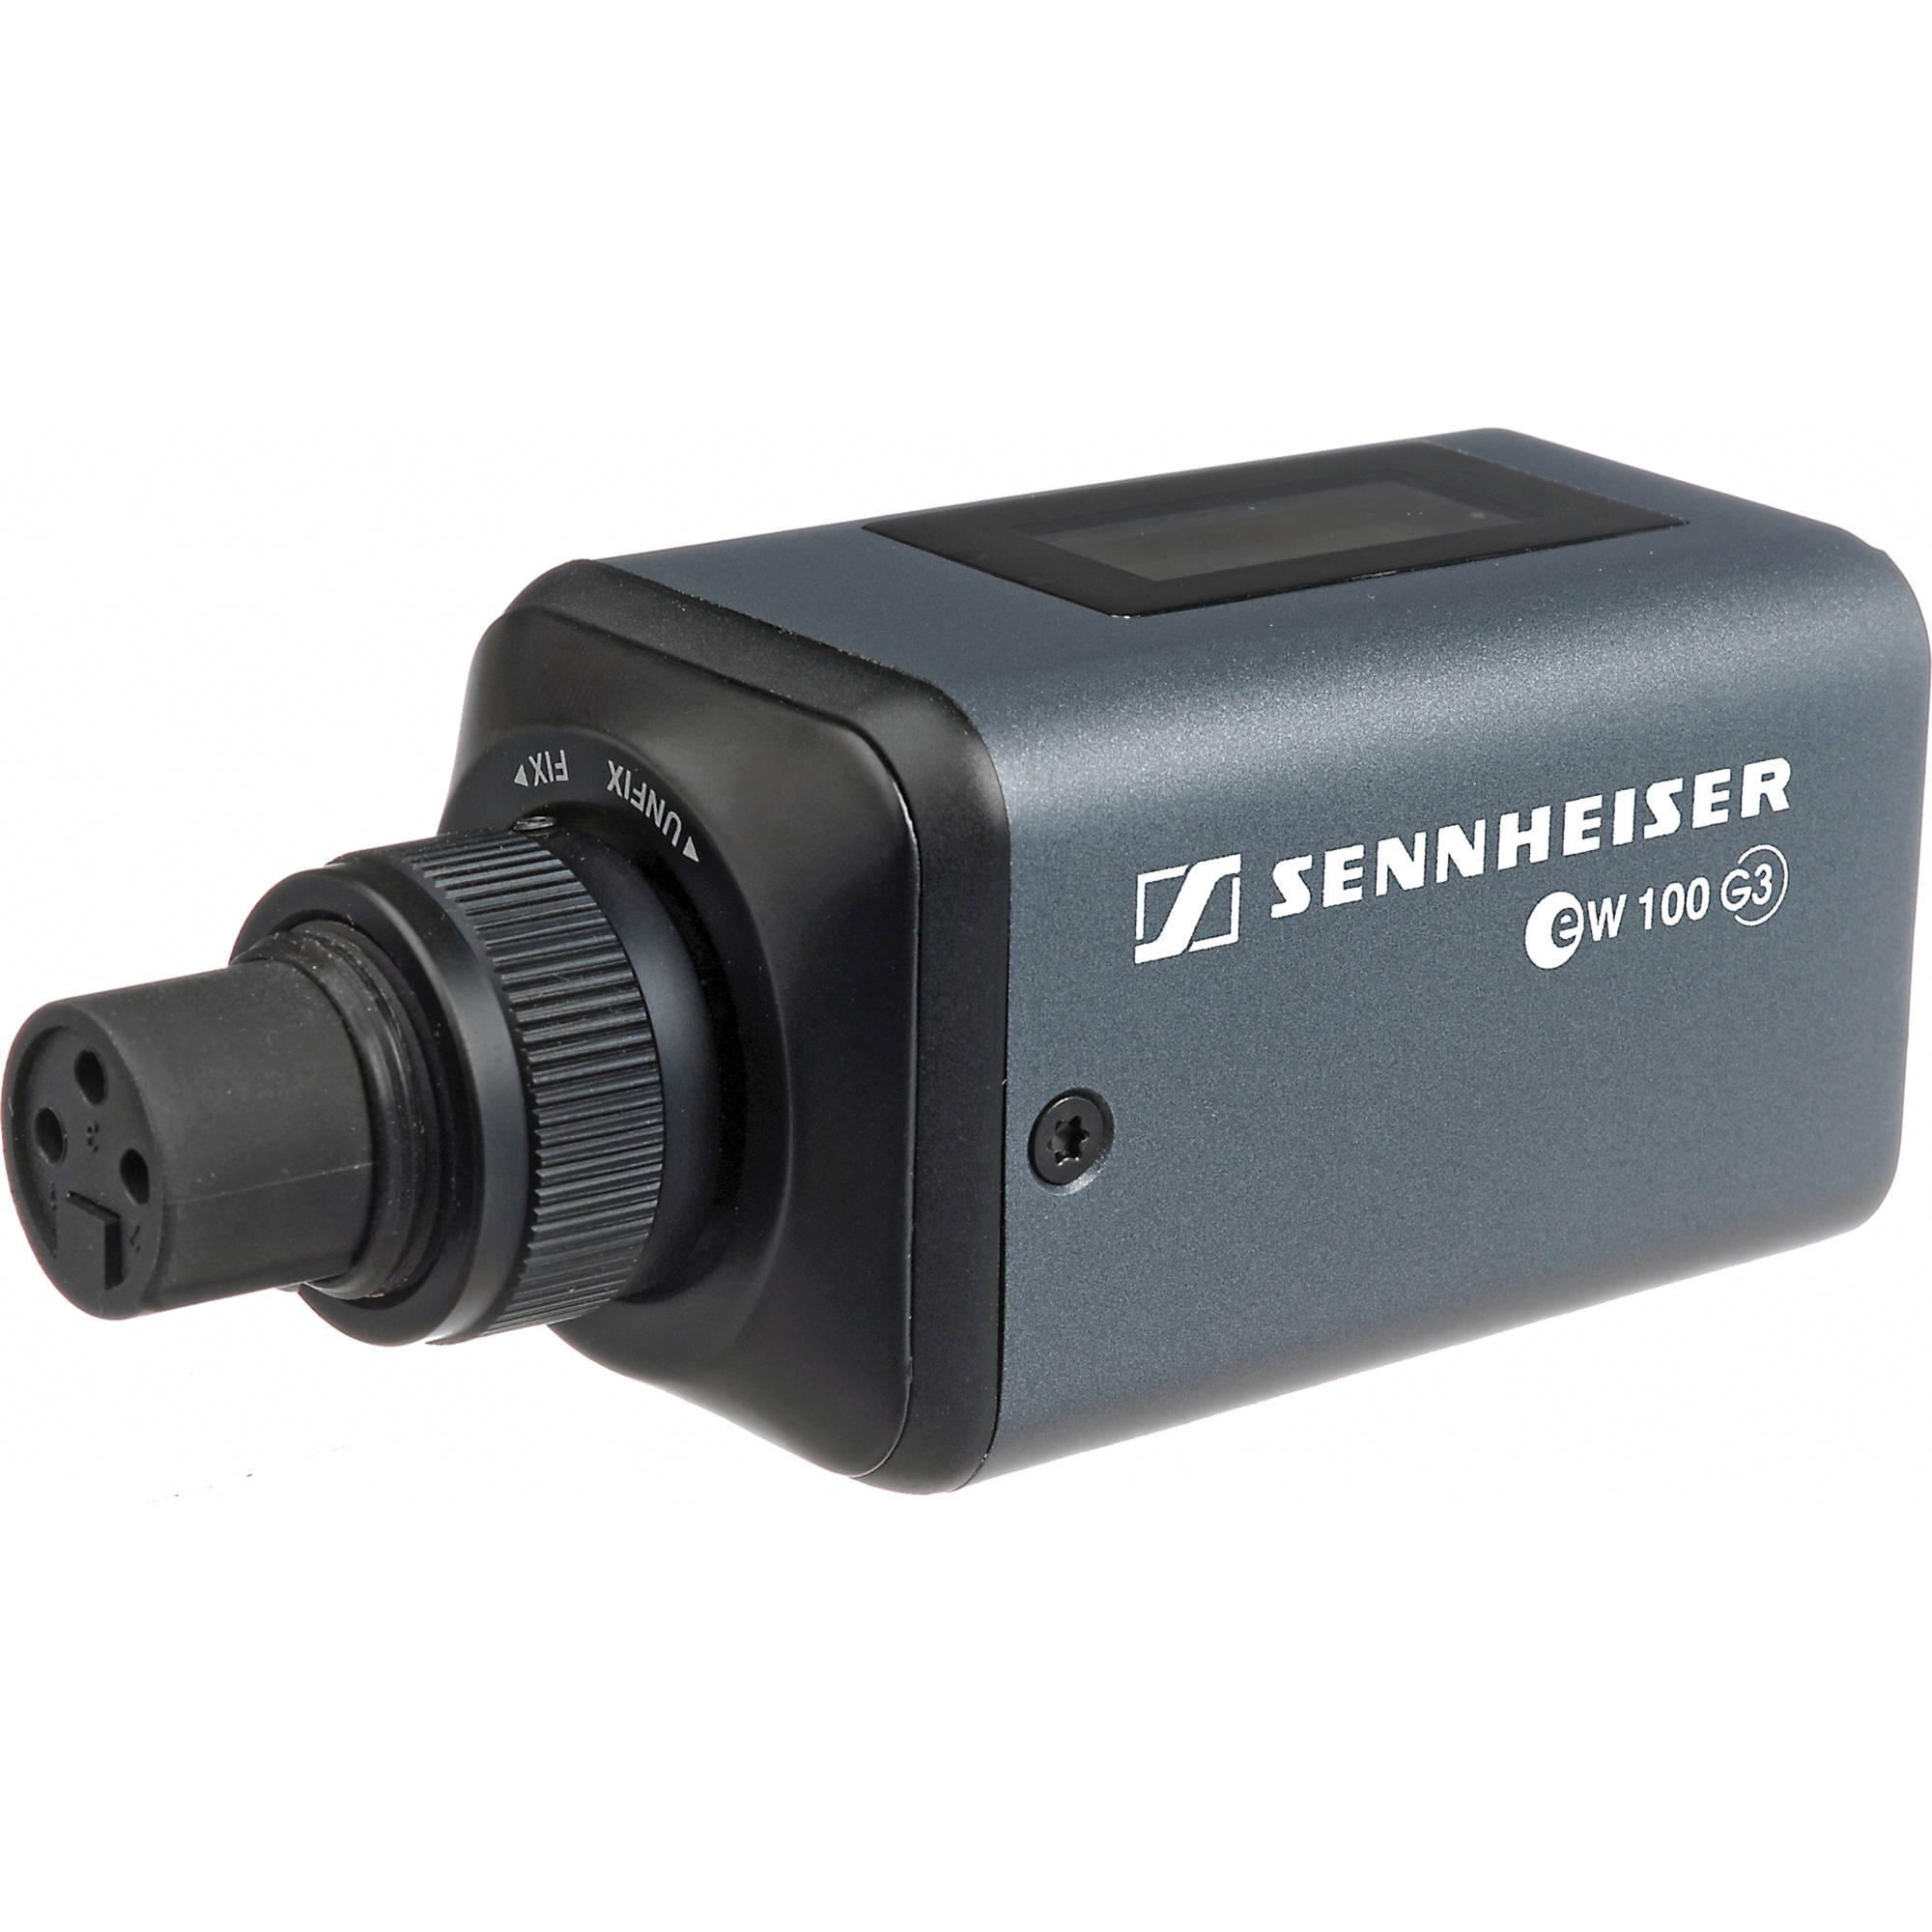 sennheiser skp 100 g3 plug on transmitter for dynamic skp100g3 g. Black Bedroom Furniture Sets. Home Design Ideas